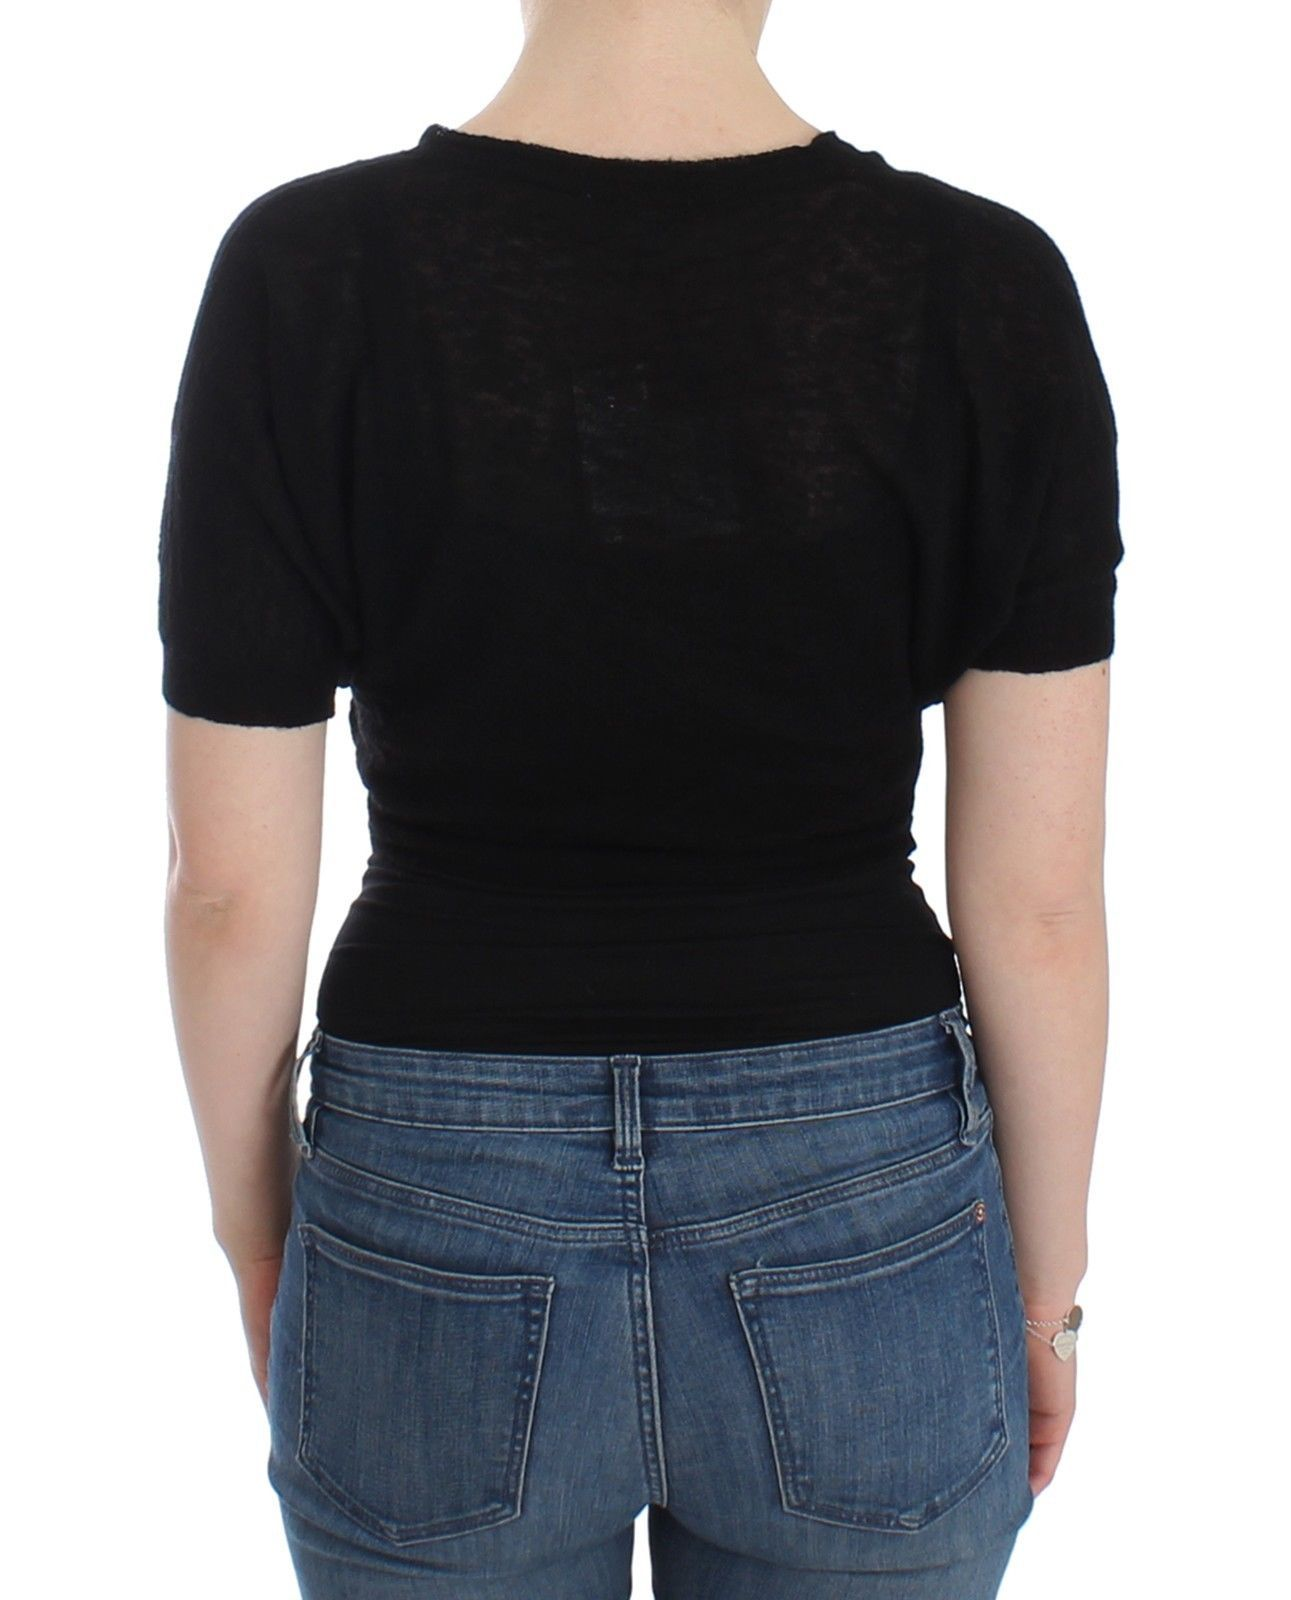 Ermanno Scervino Lingerie Knit Black Wool Sweater Cardigan